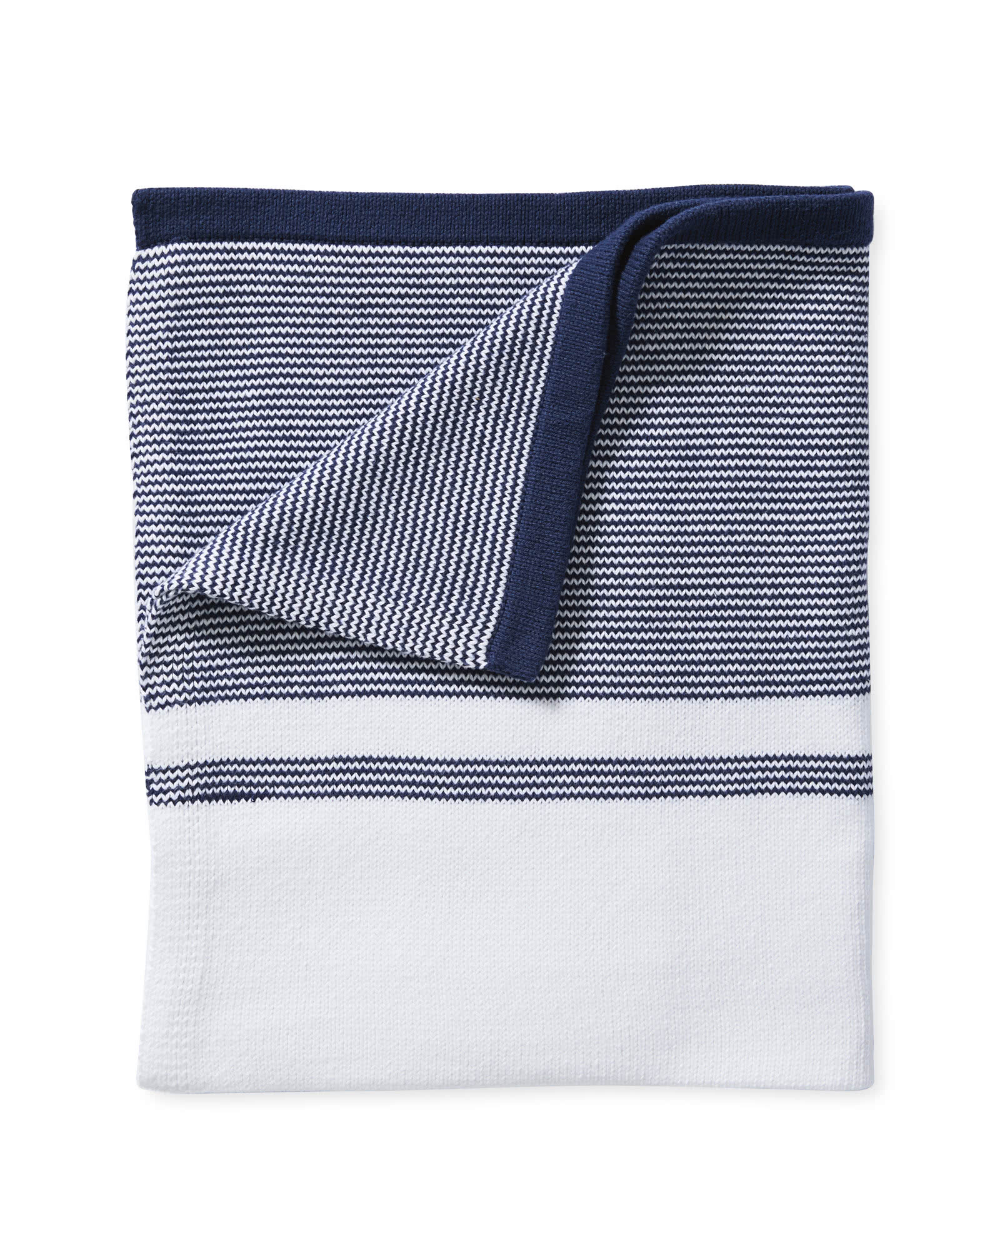 Bayside Blanket Navy Serena Amp Lily Pottery Barn